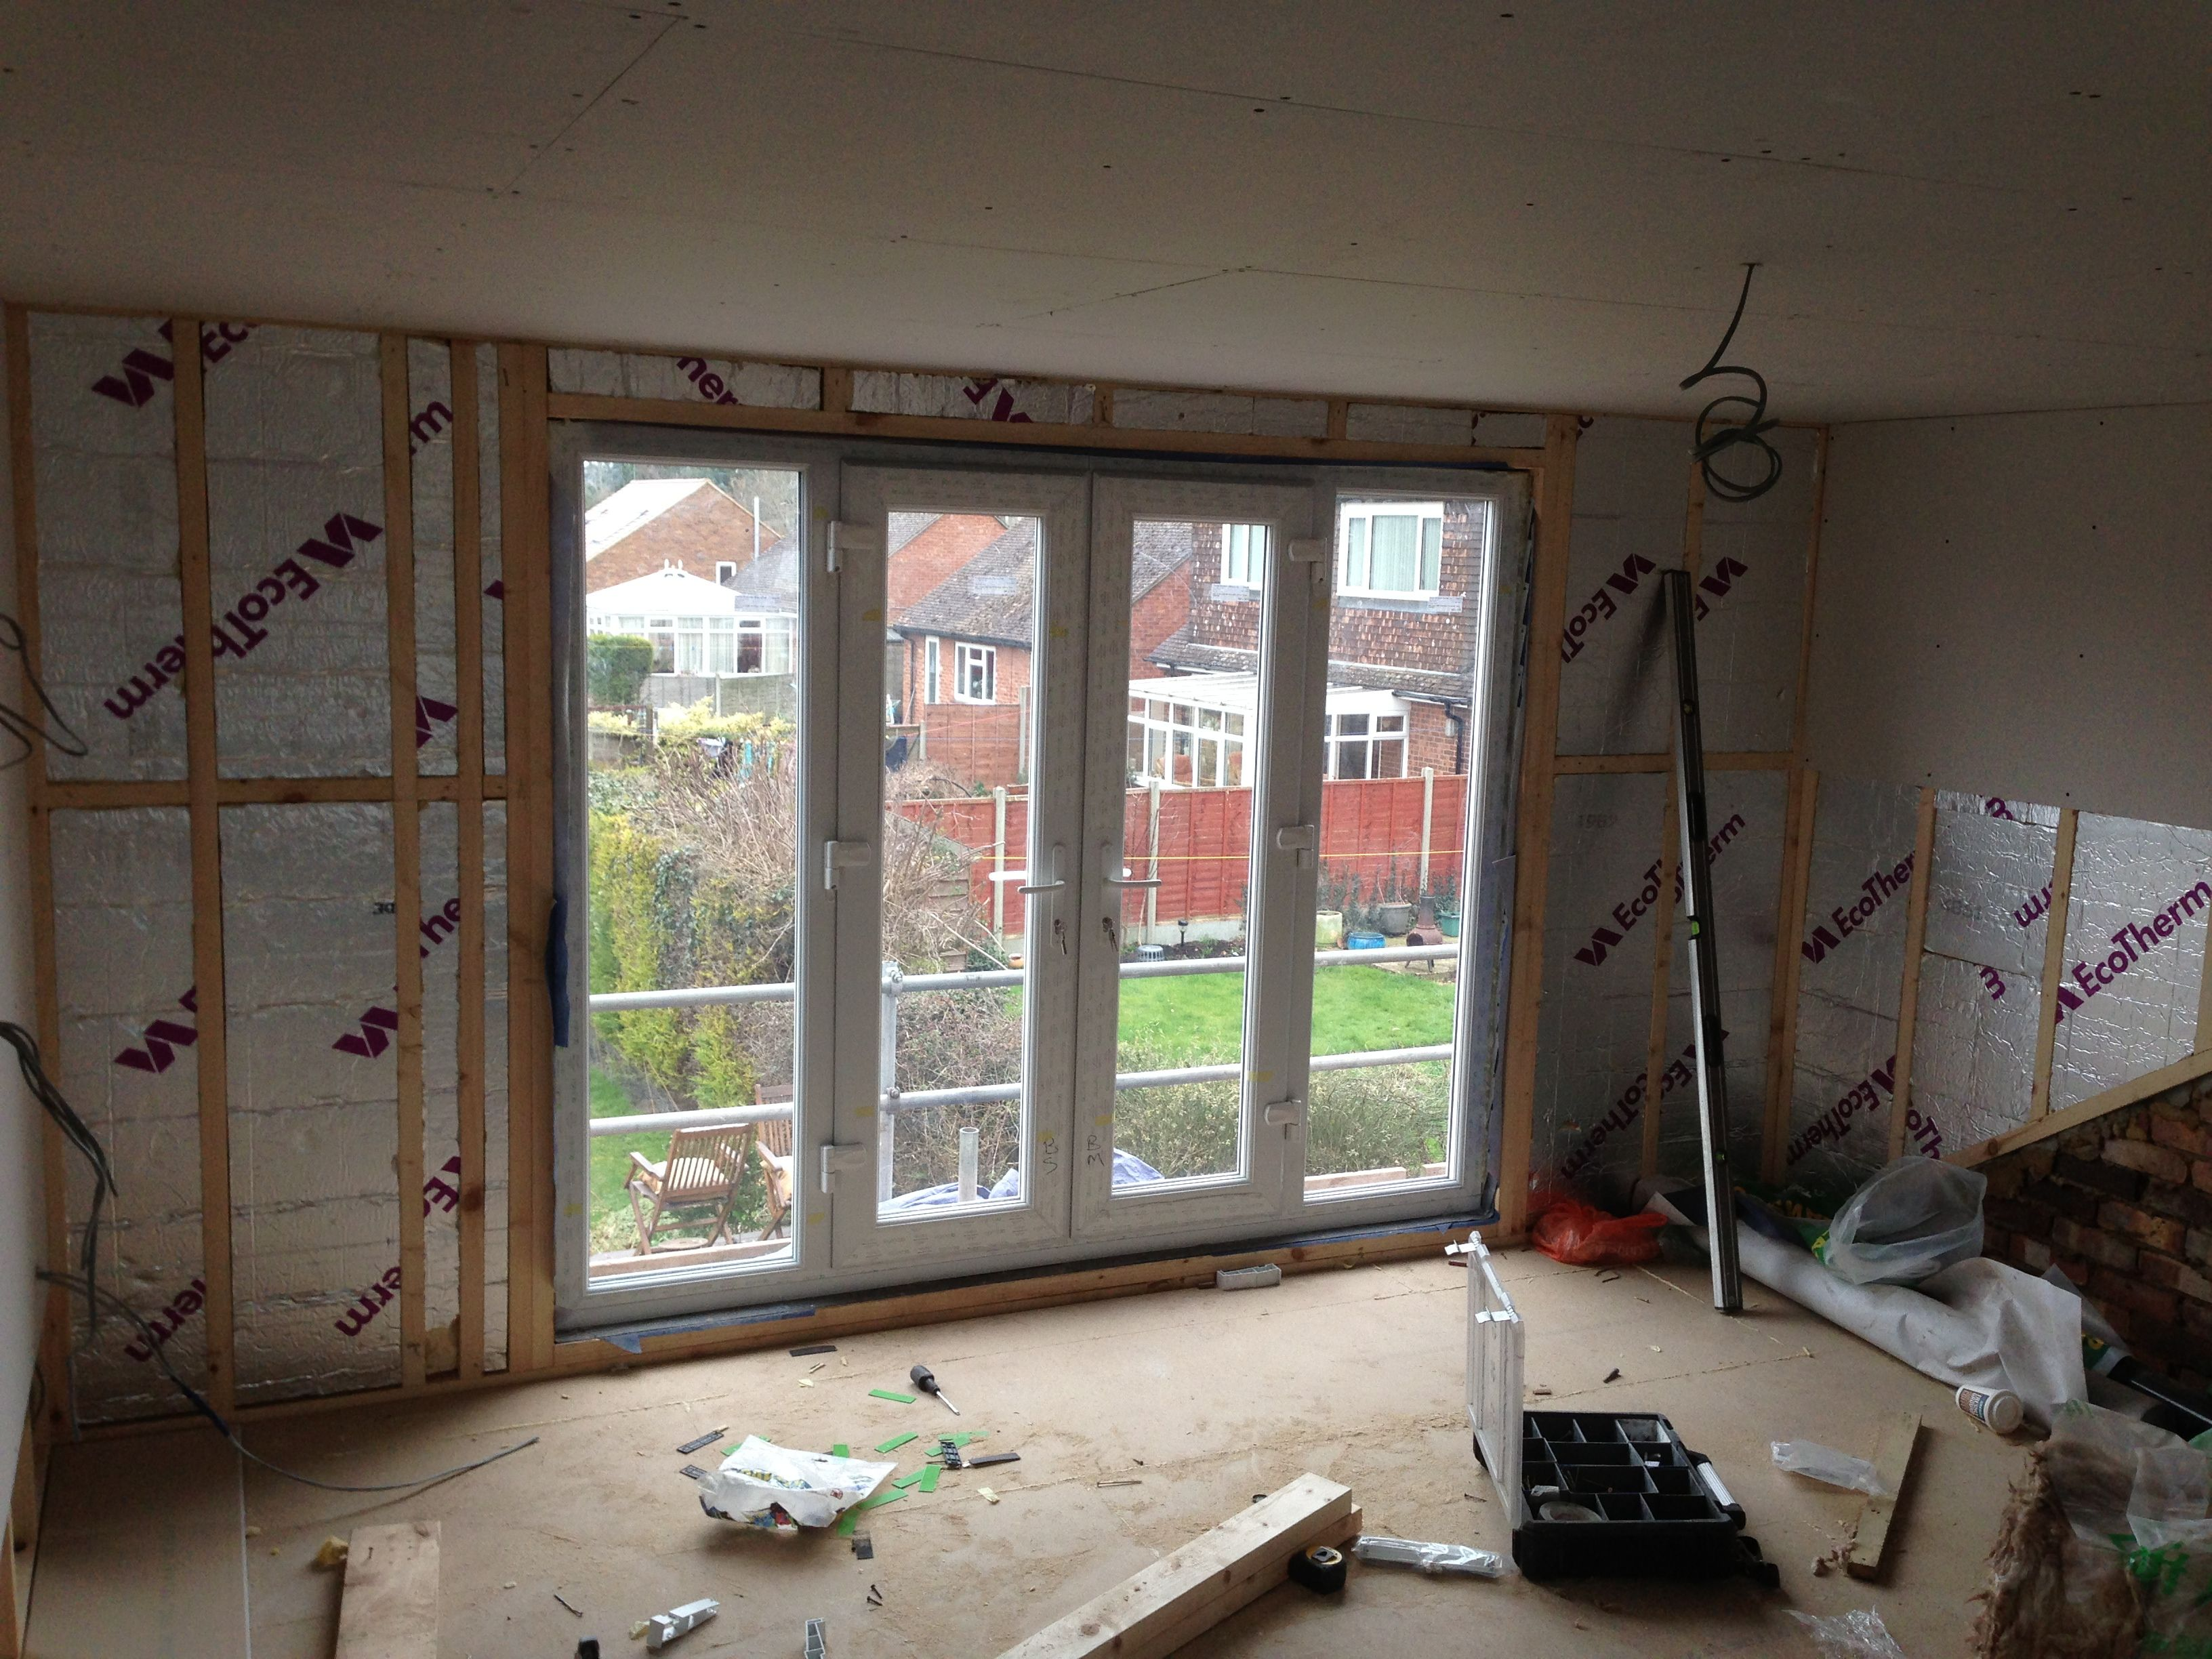 french doors, Juliette balcony, loft conversion | Home ...